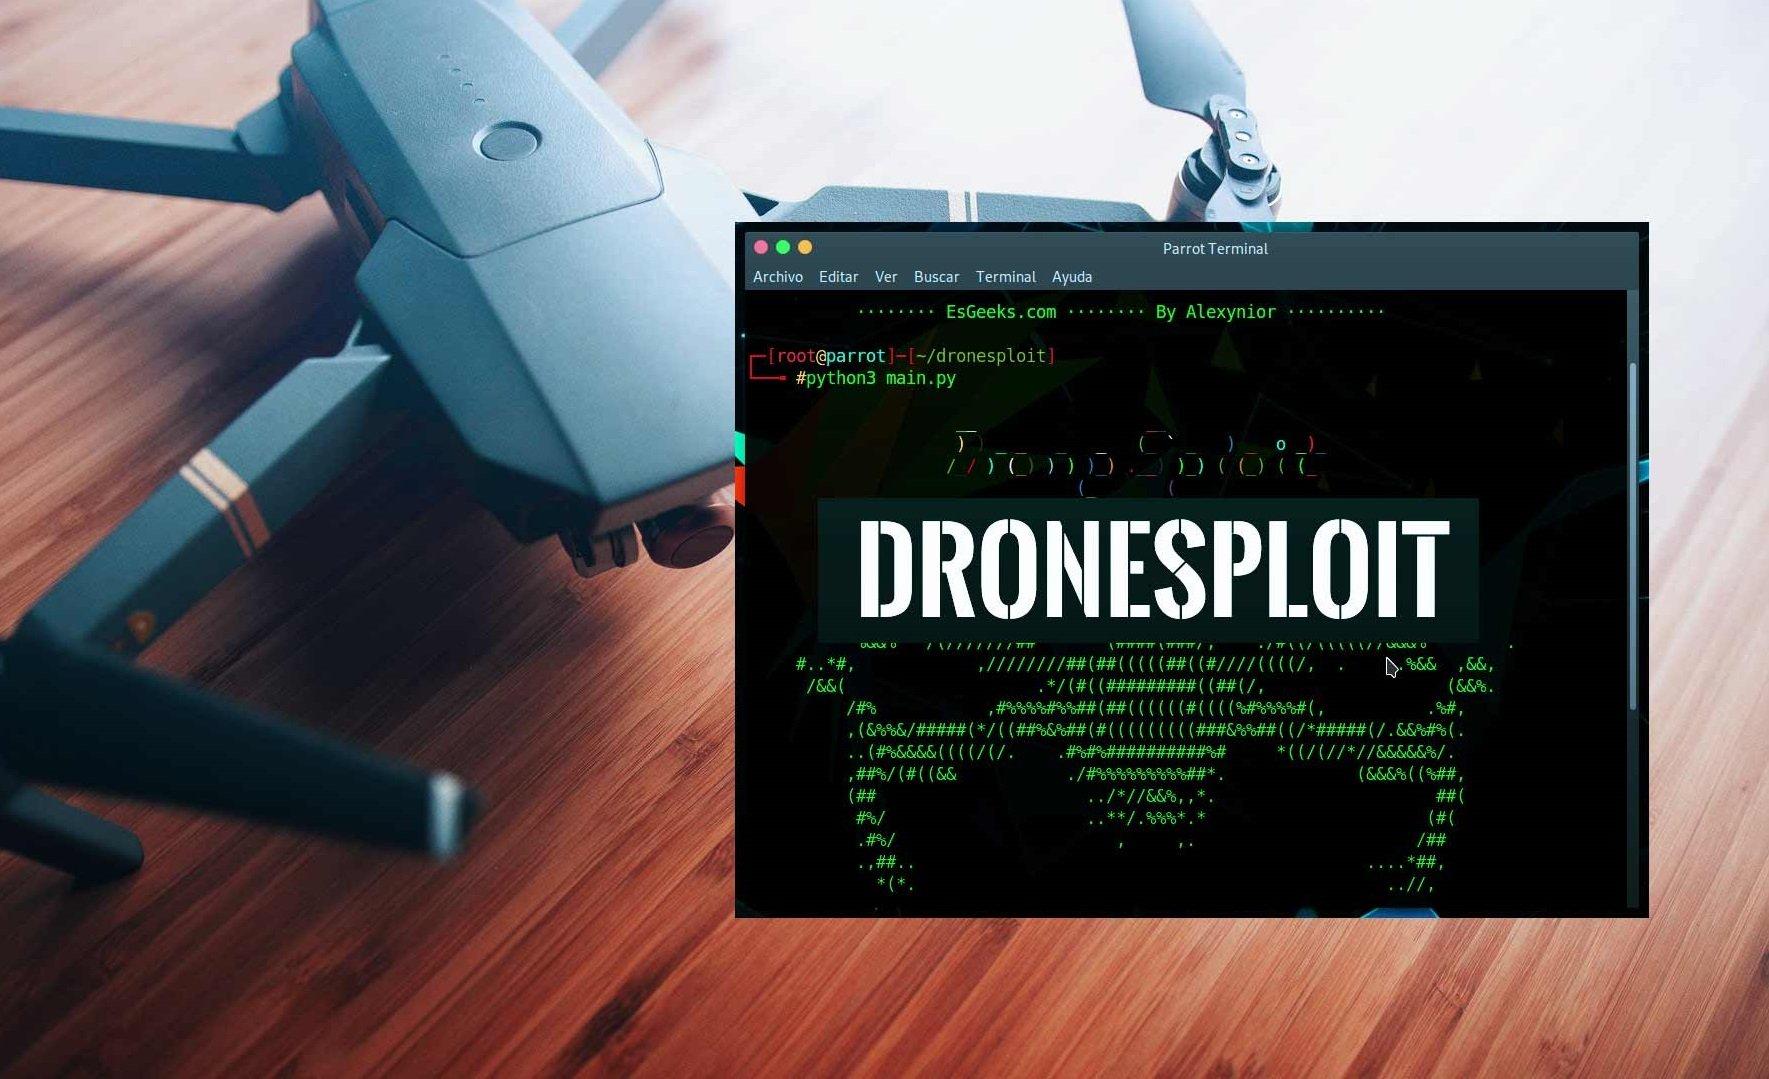 DroneSploit Drone Hacking Exploit DroneSec Analysis